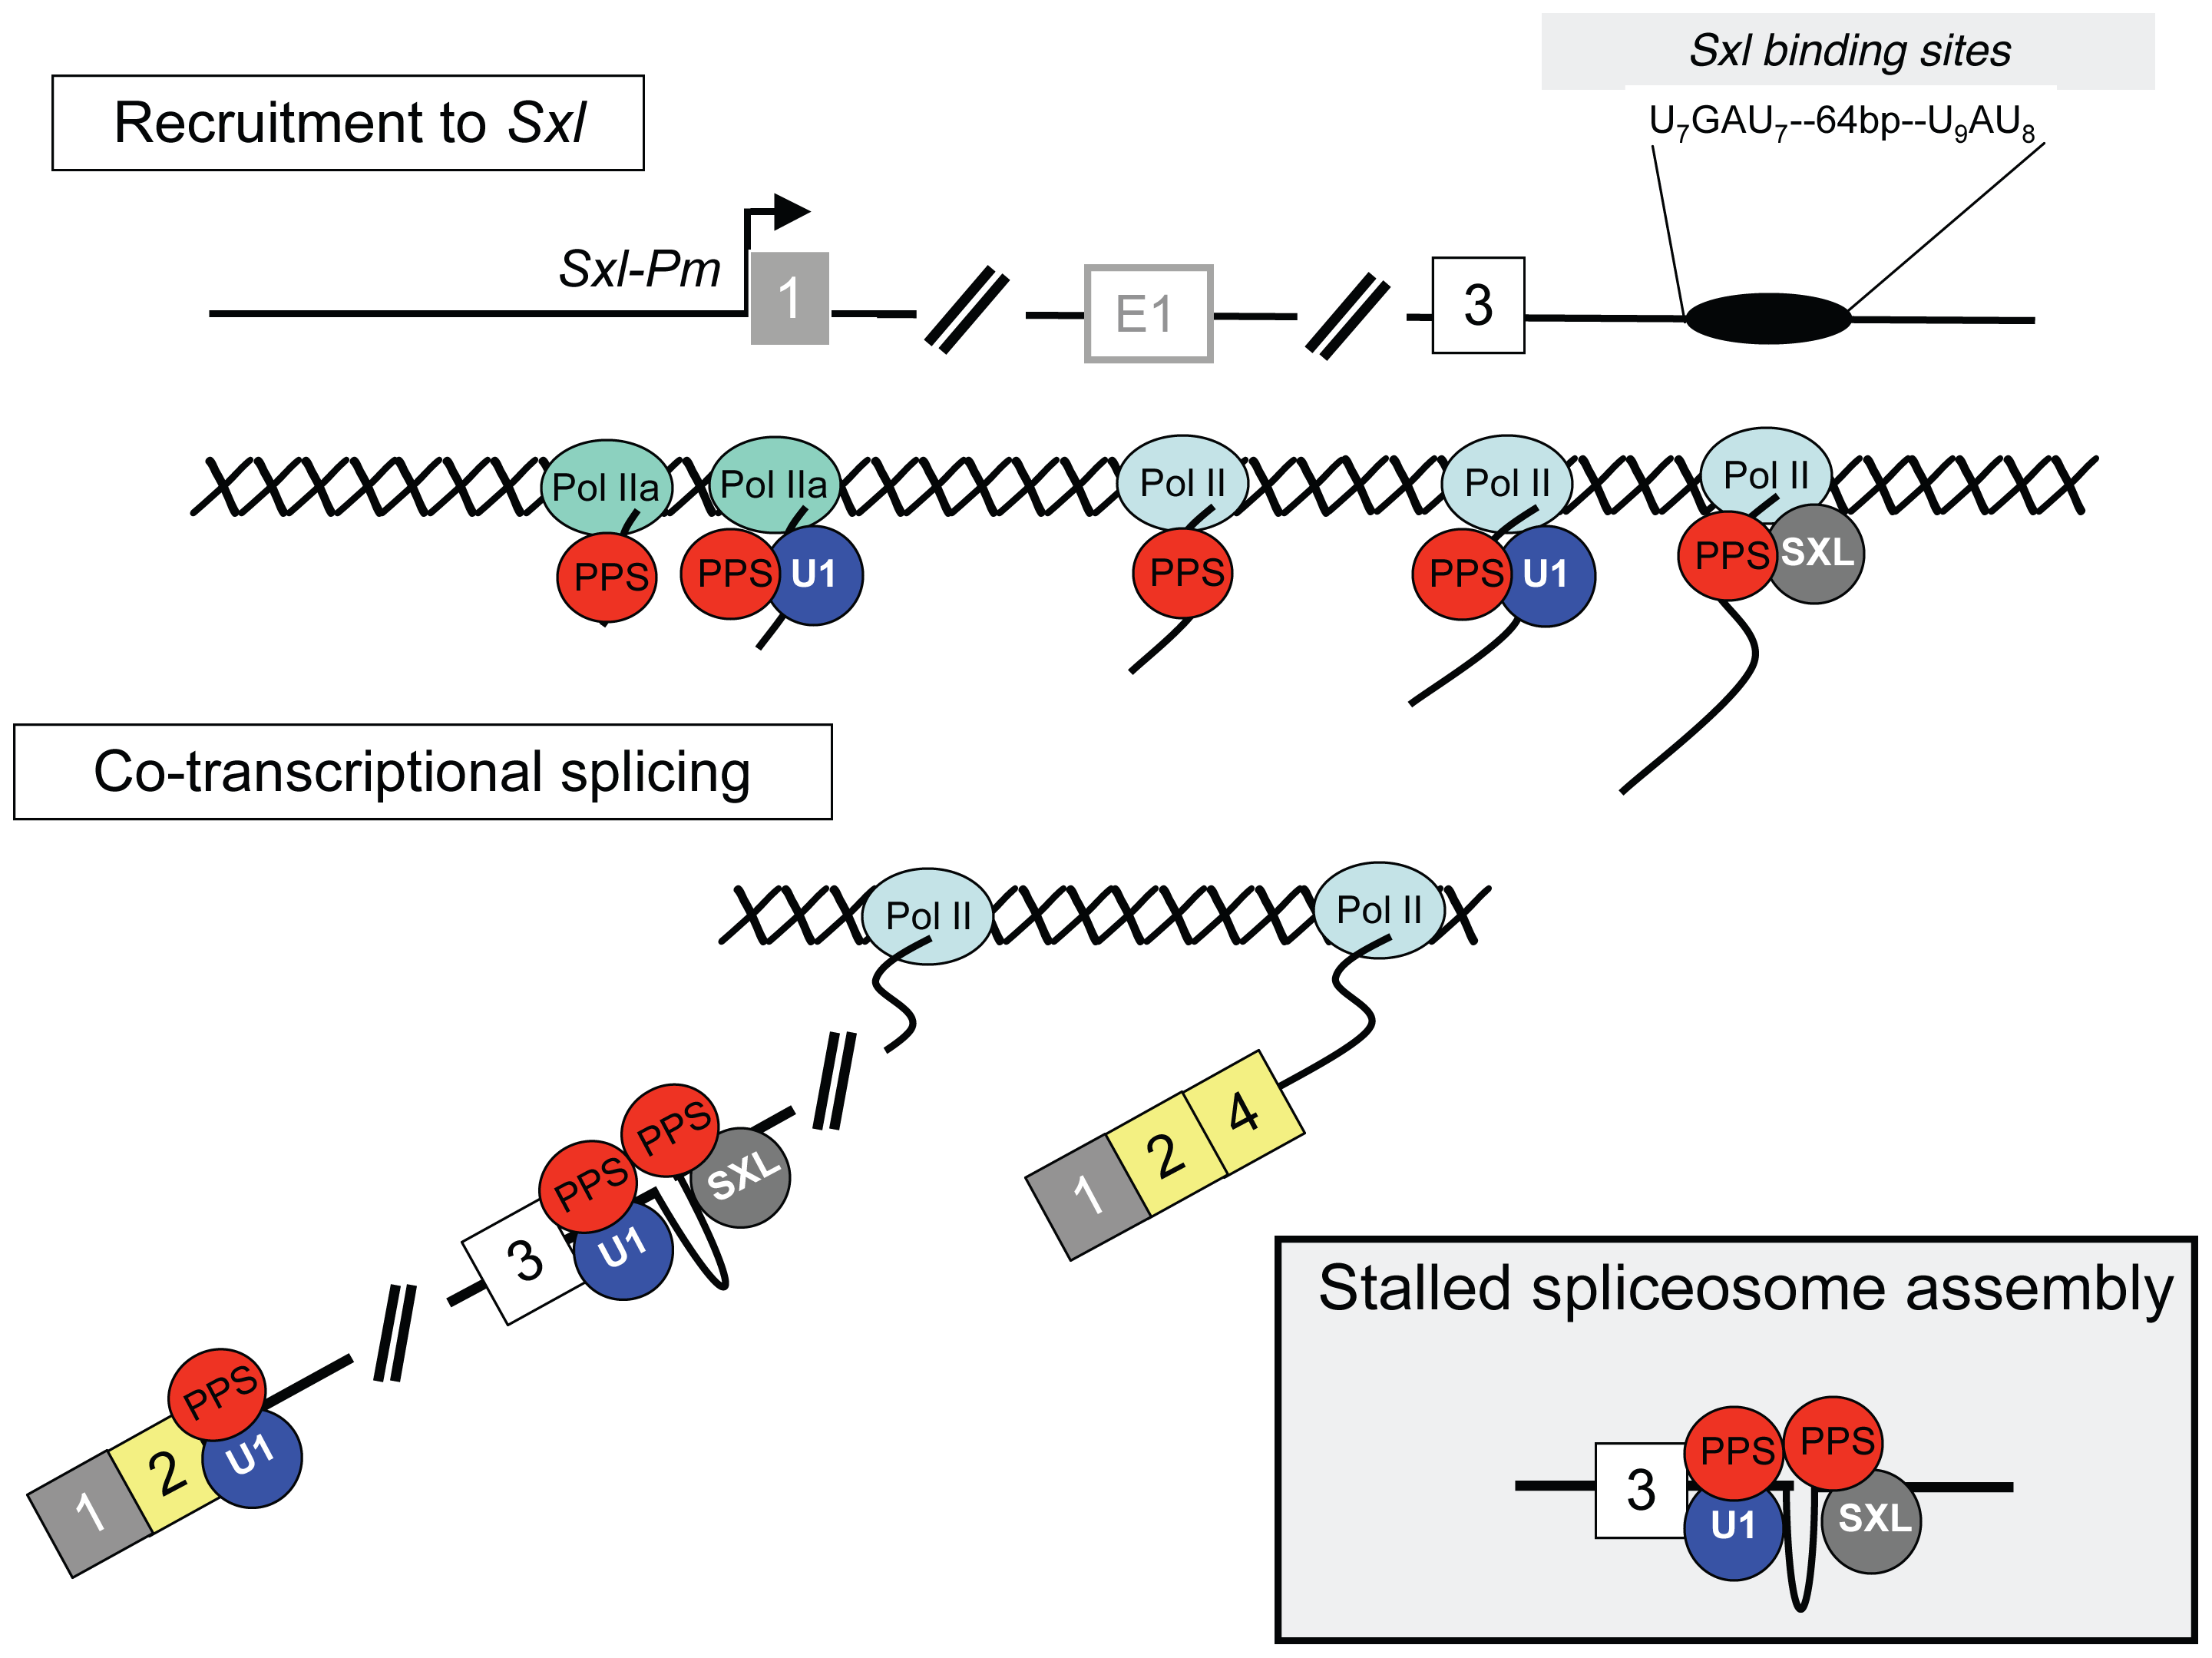 Co-transcriptional model for <i>Sxl</i> splicing autoregulation.